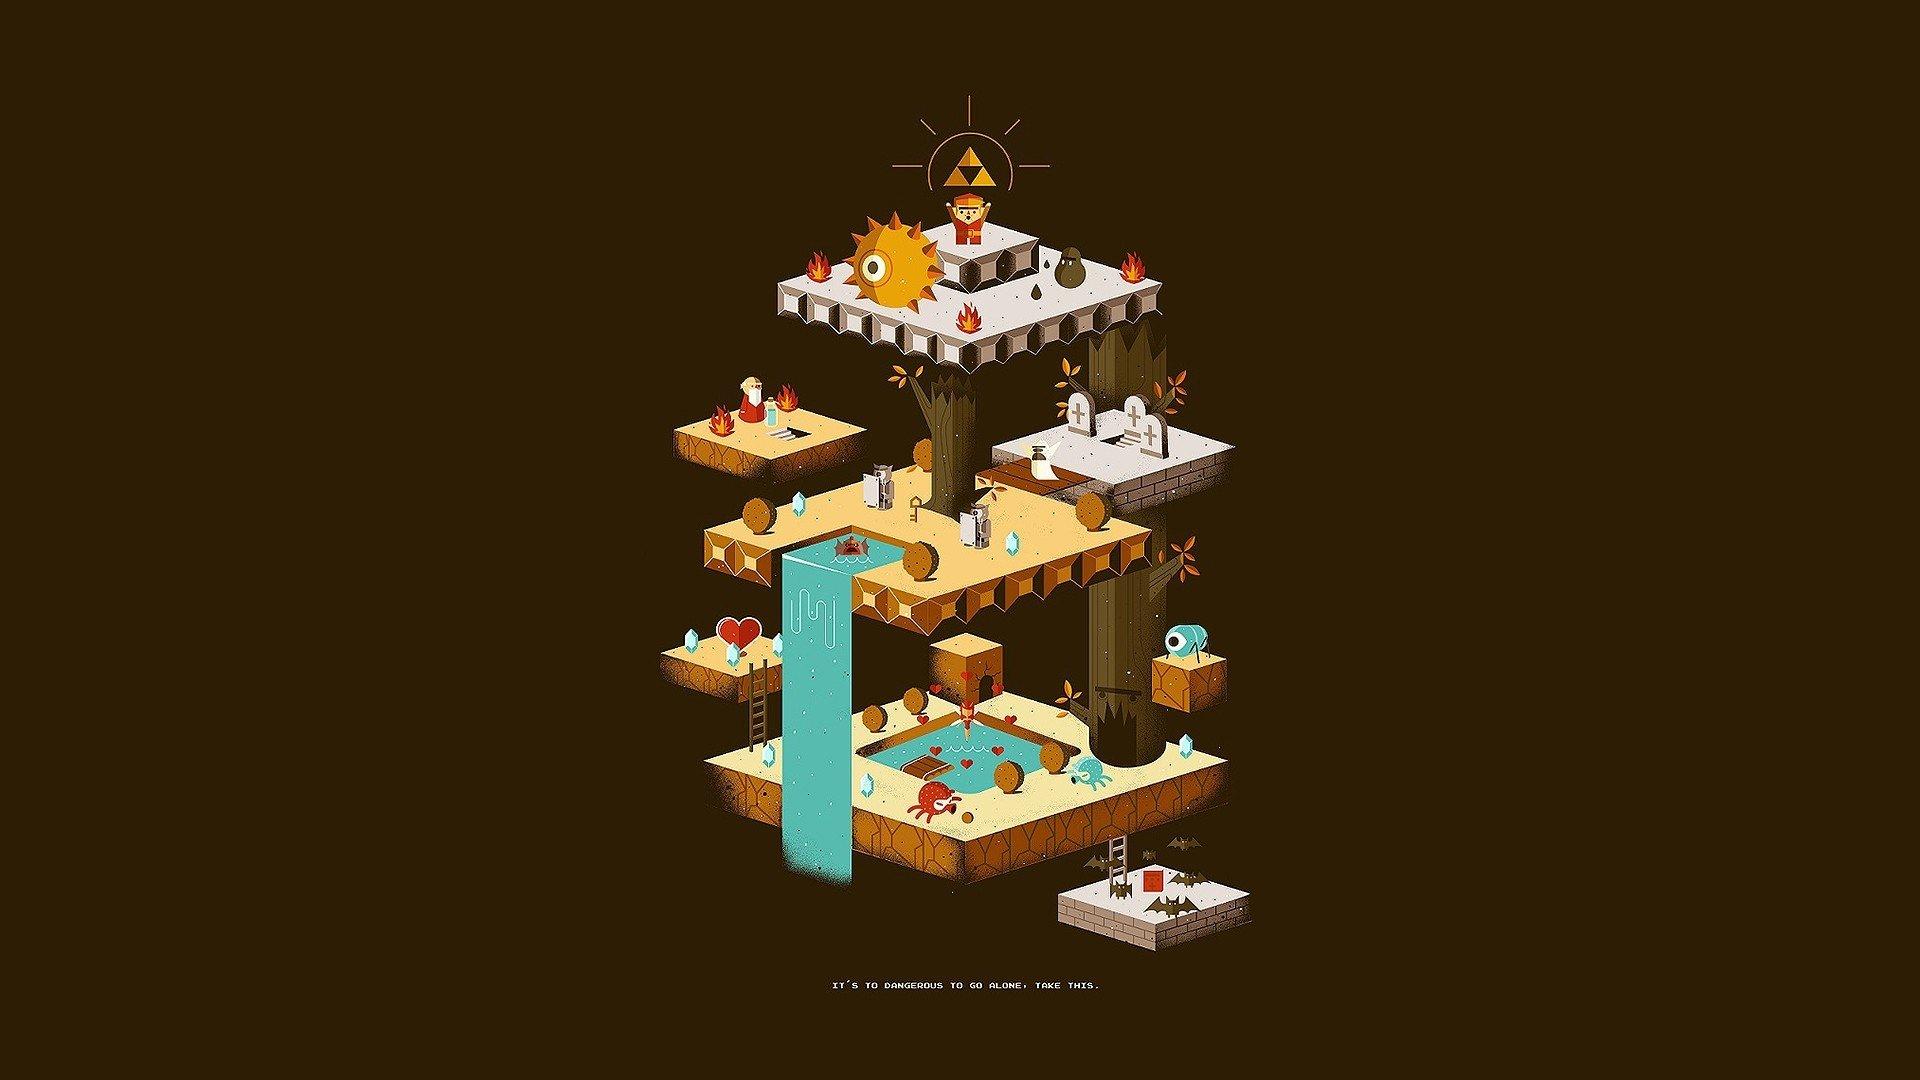 The Legend Of Zelda Hd Wallpaper Background Image 1920x1080